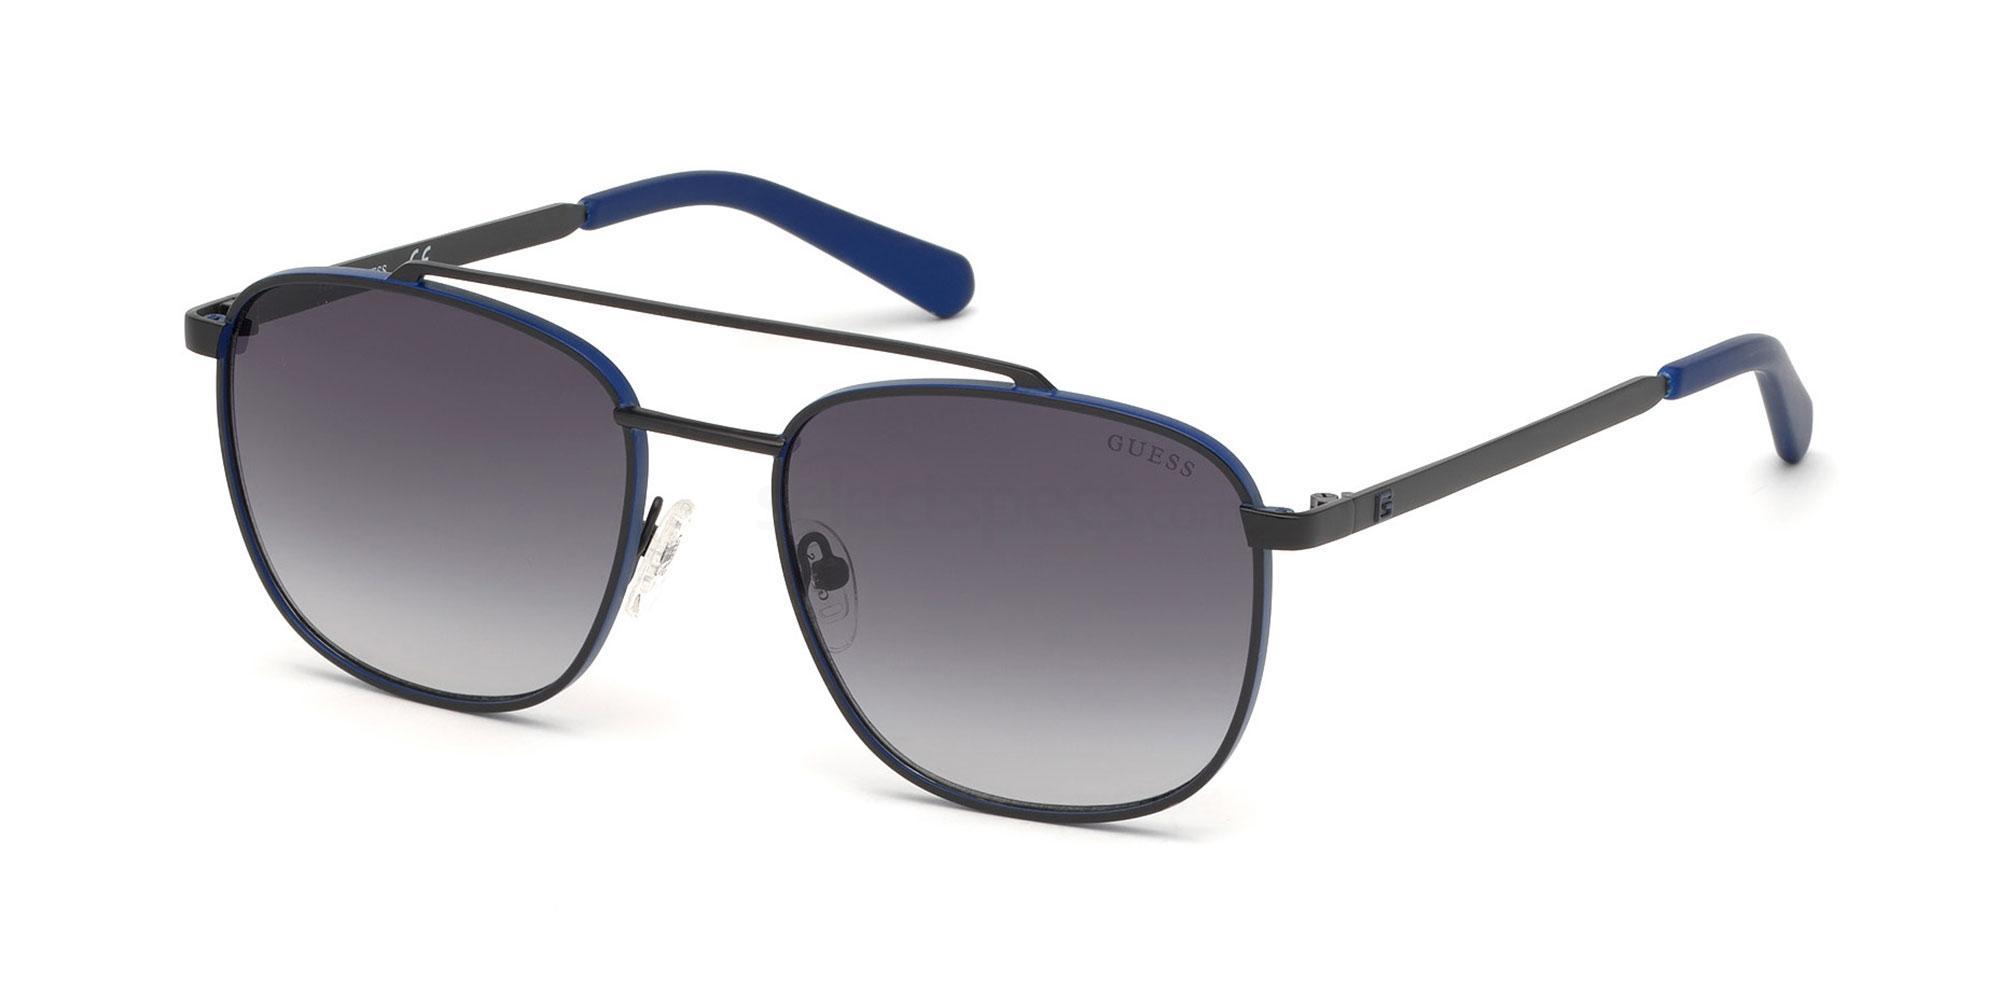 02B GU6946 Sunglasses, Guess